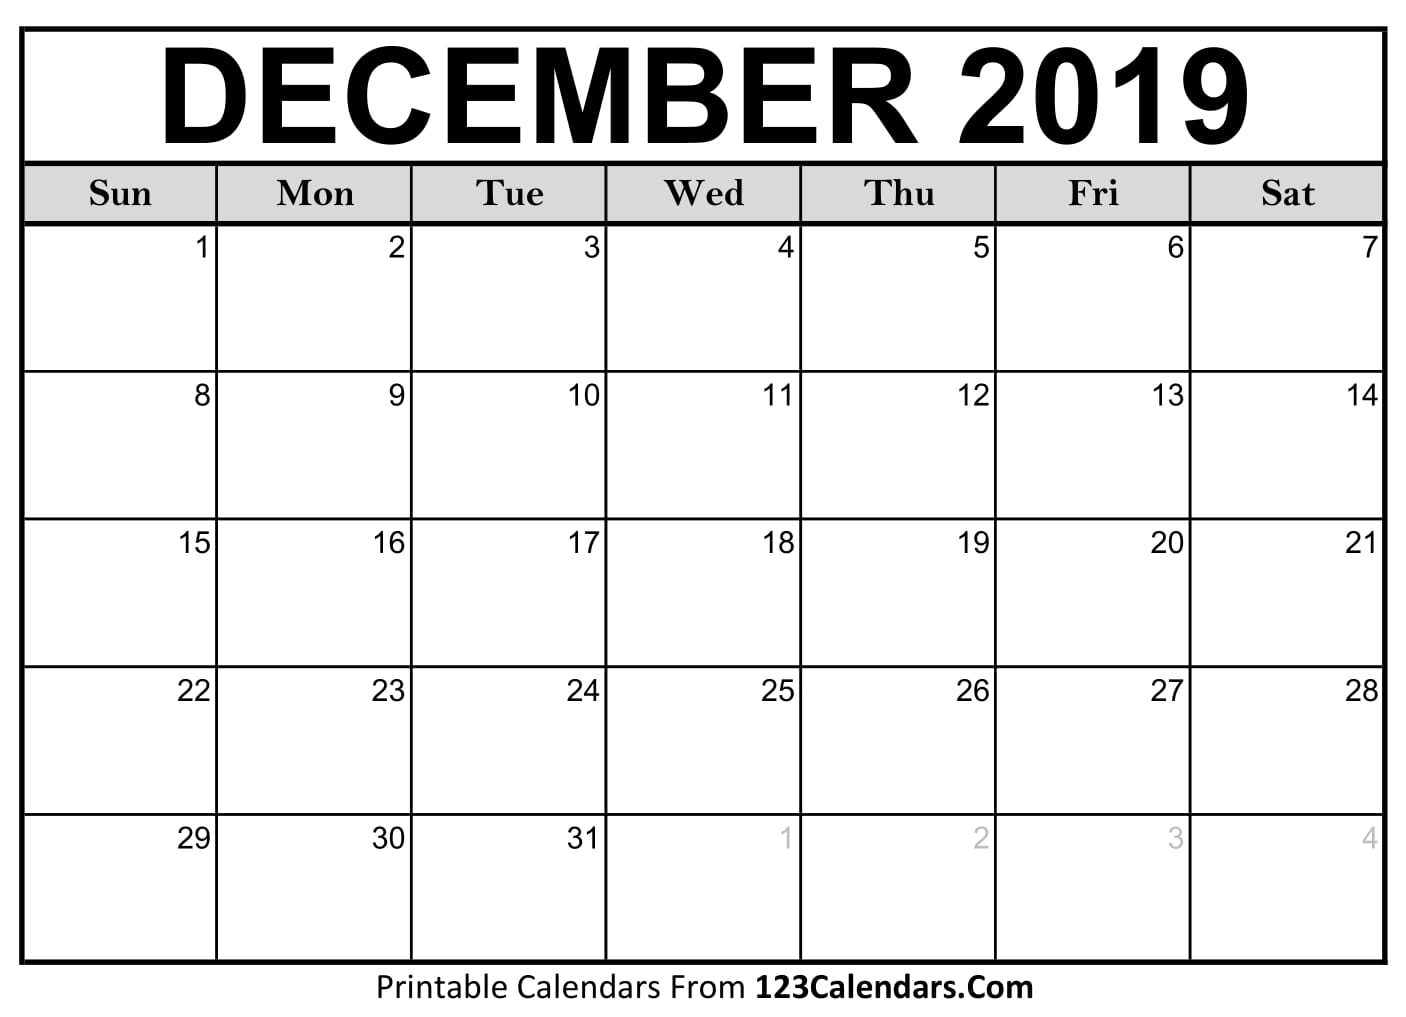 December 2019 Printable Calendar | 123Calendars with regard to Printable Blank Calendar For December